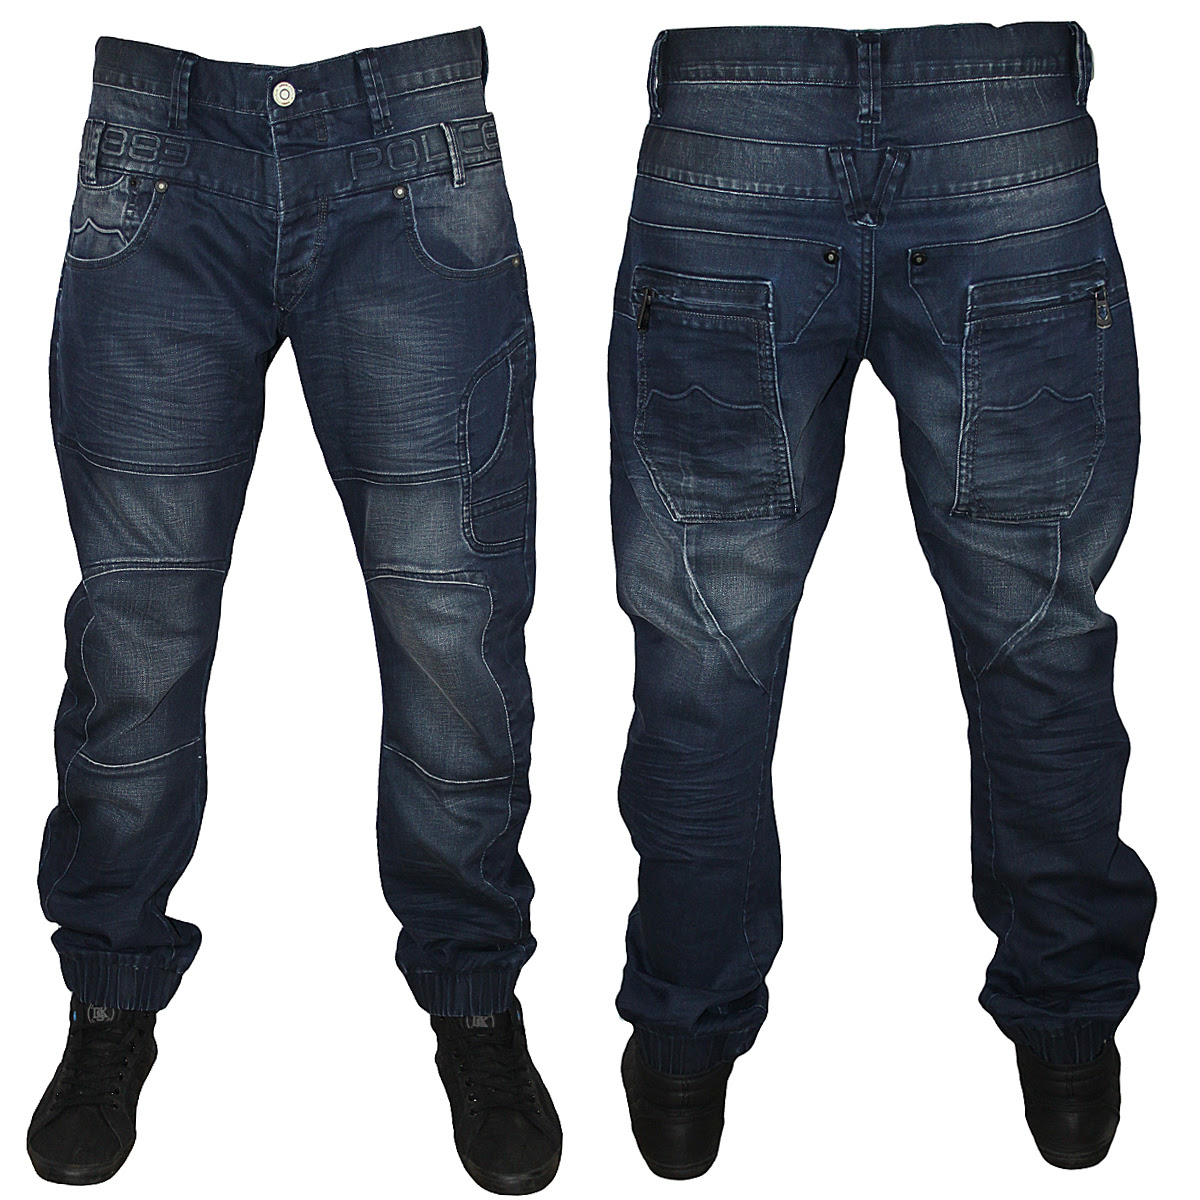 Clothes, Shoes amp; Accessories gt; Men39;s Clothing gt; Jeans